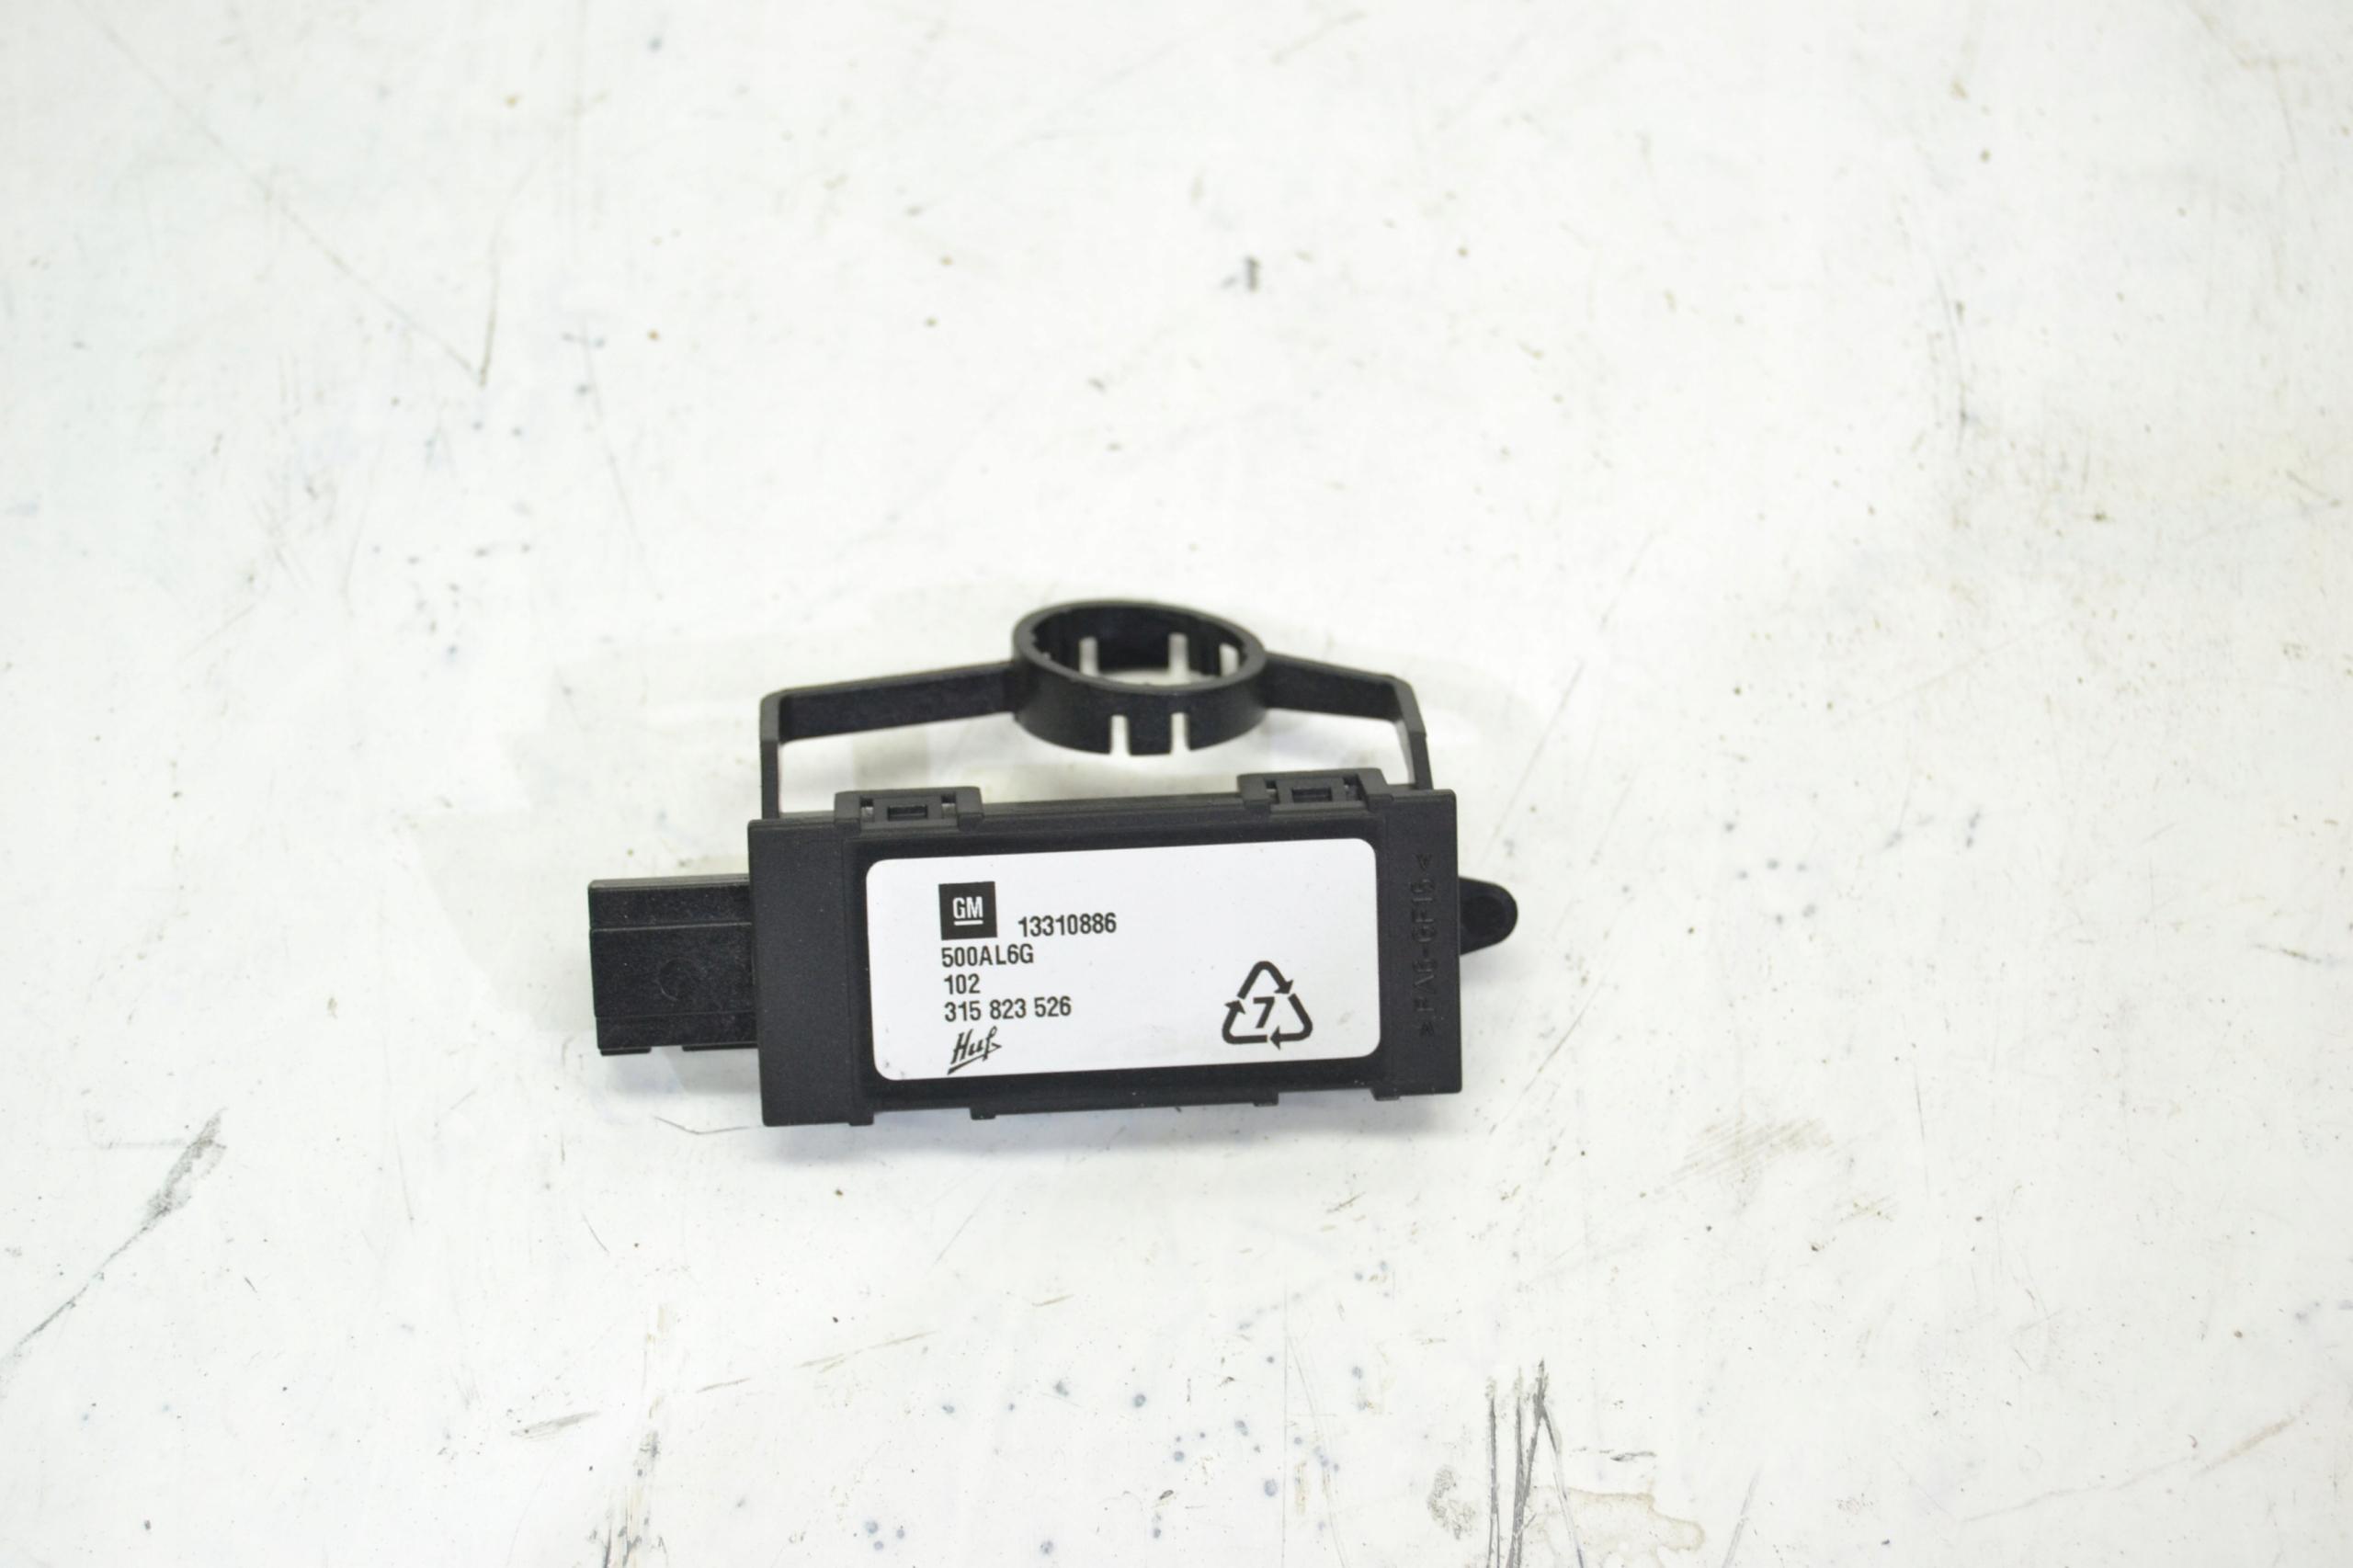 Opel Meriva B sensor drzwi 13310886